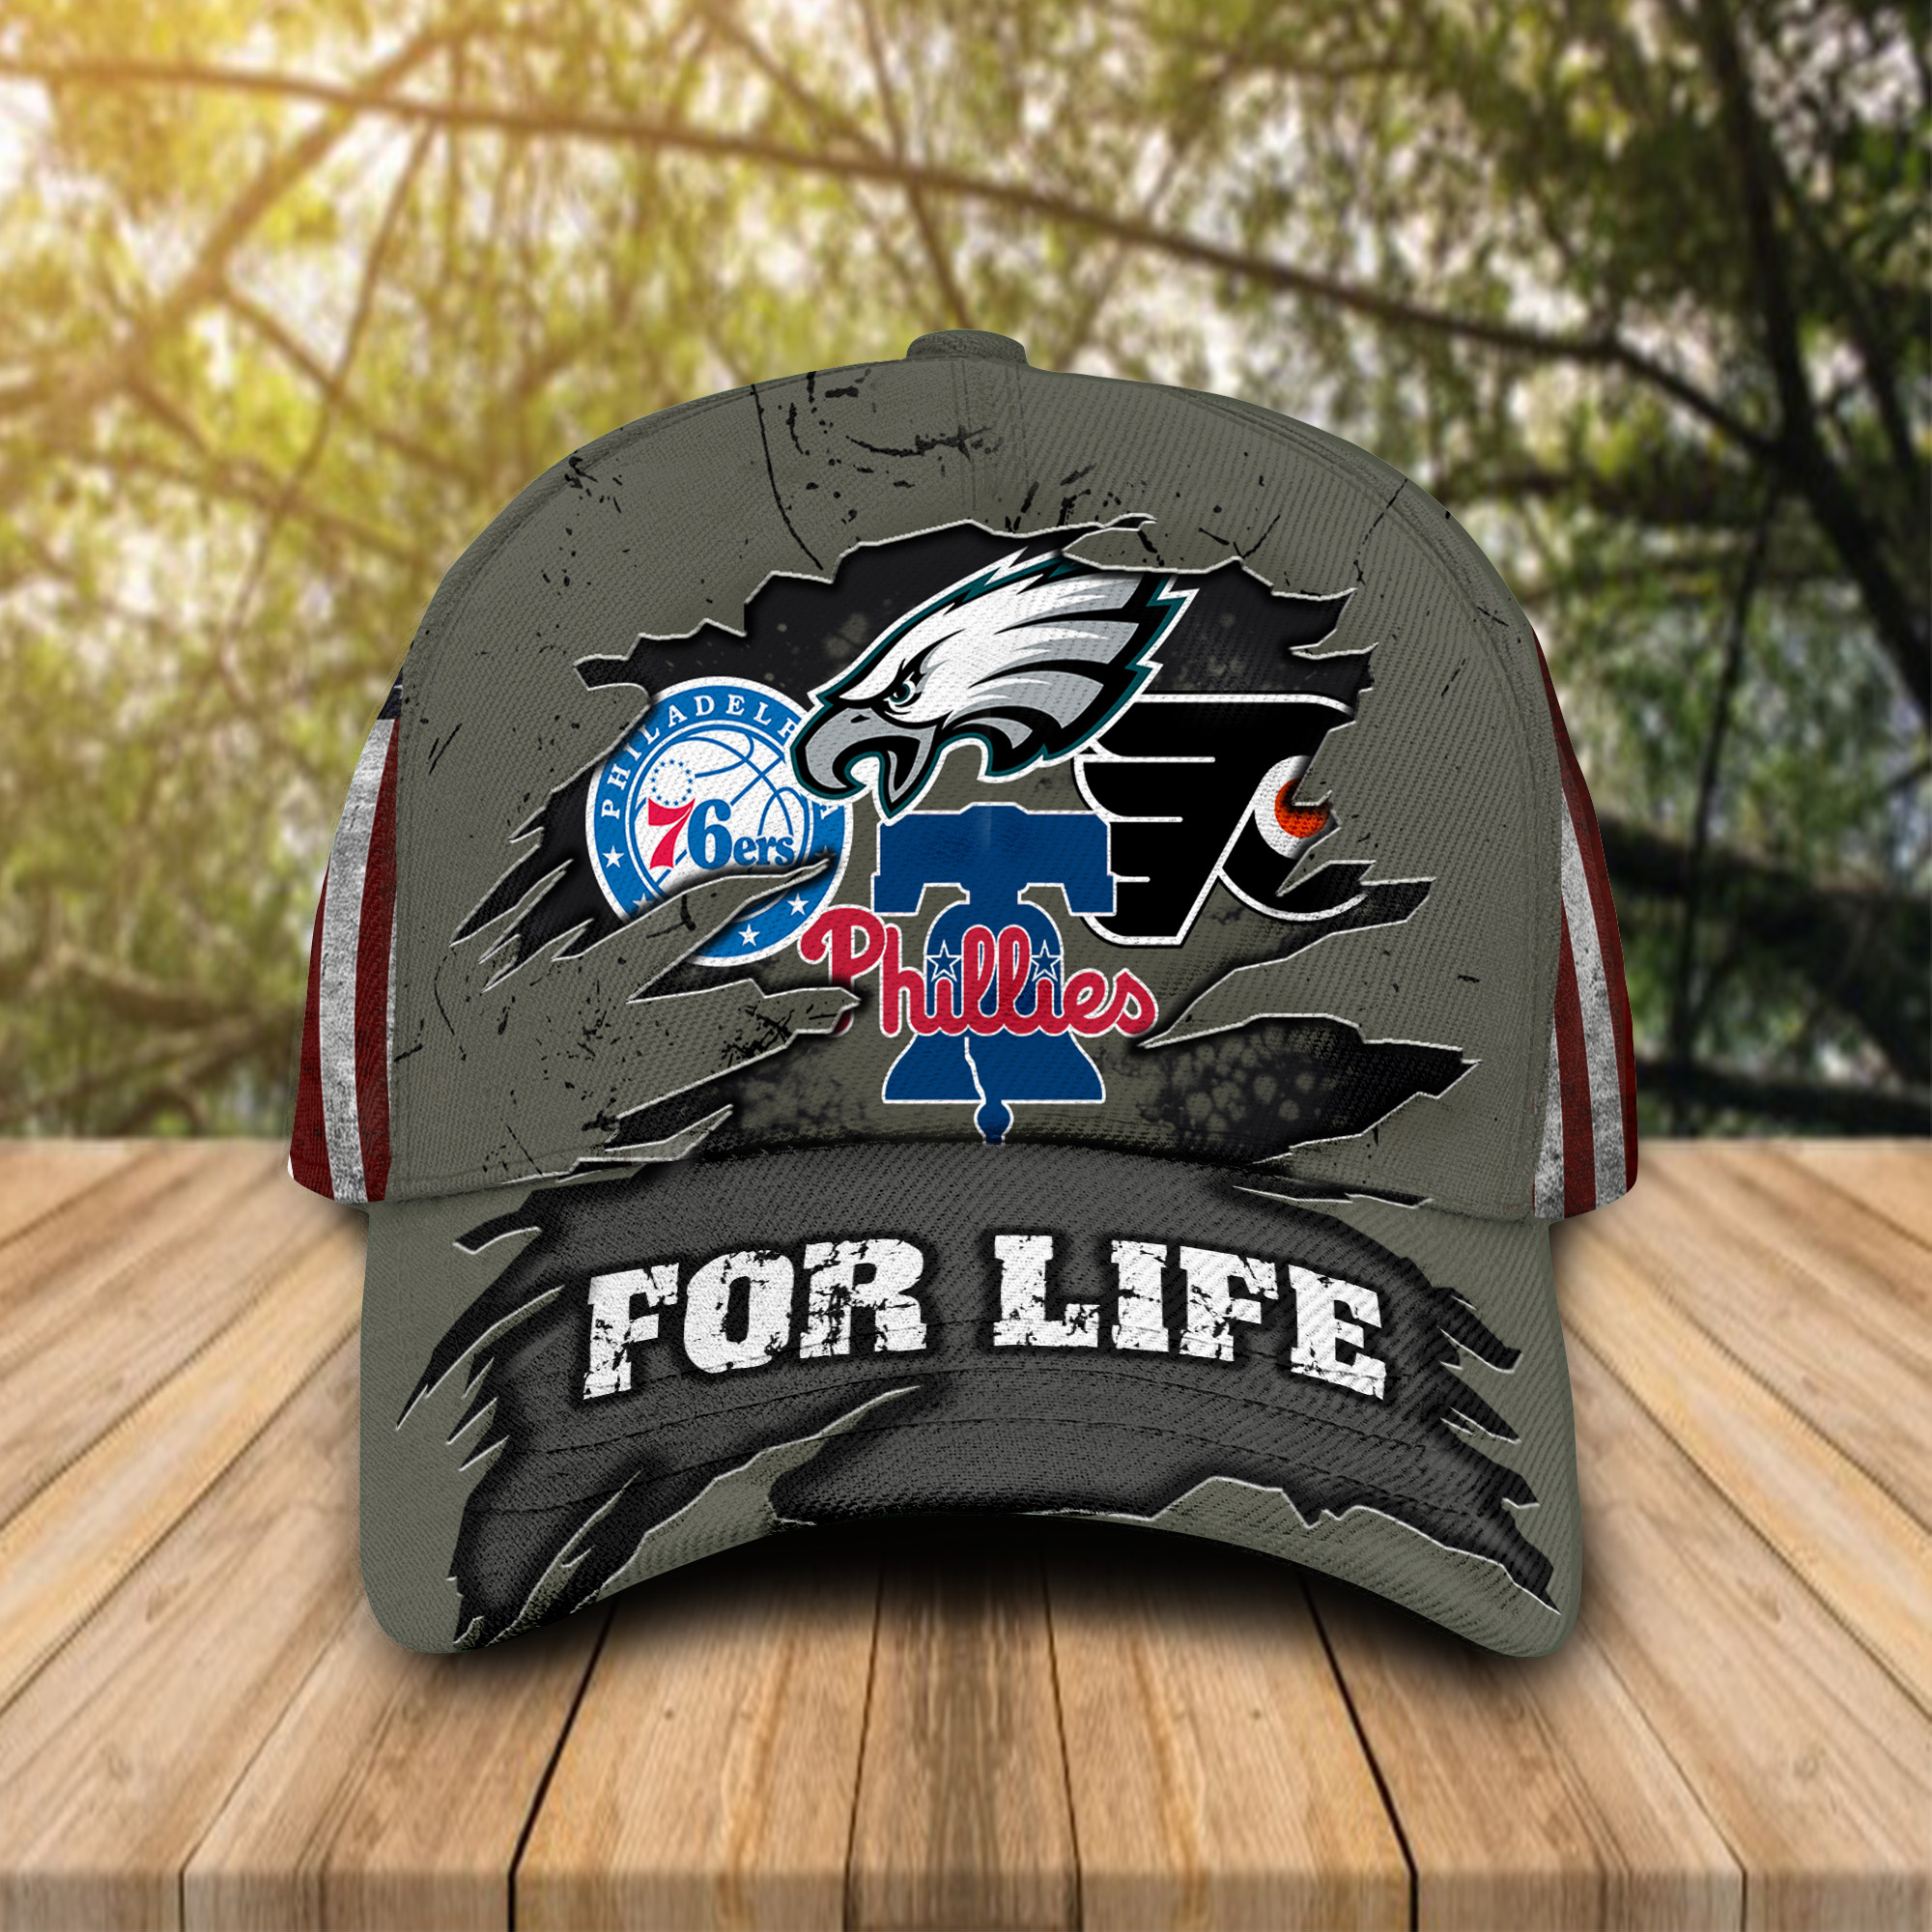 Philadelphia Eagles Flyers 76ers Phillies For Life Cap Hat